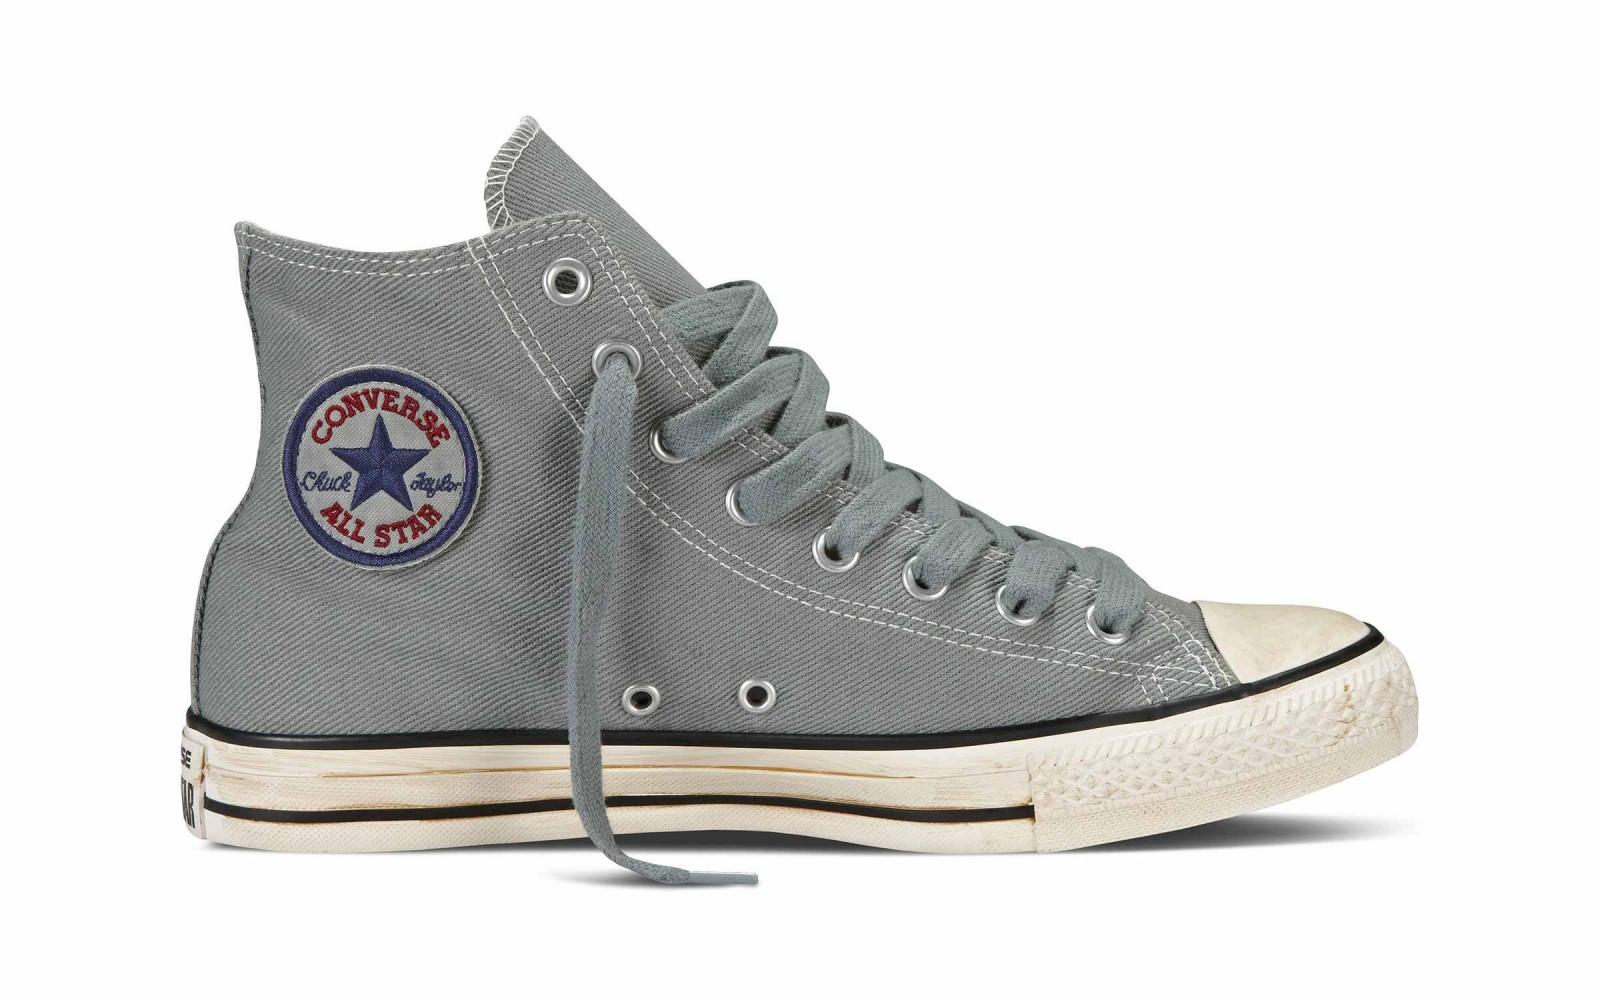 Boty Converse Chuck Taylor All Star